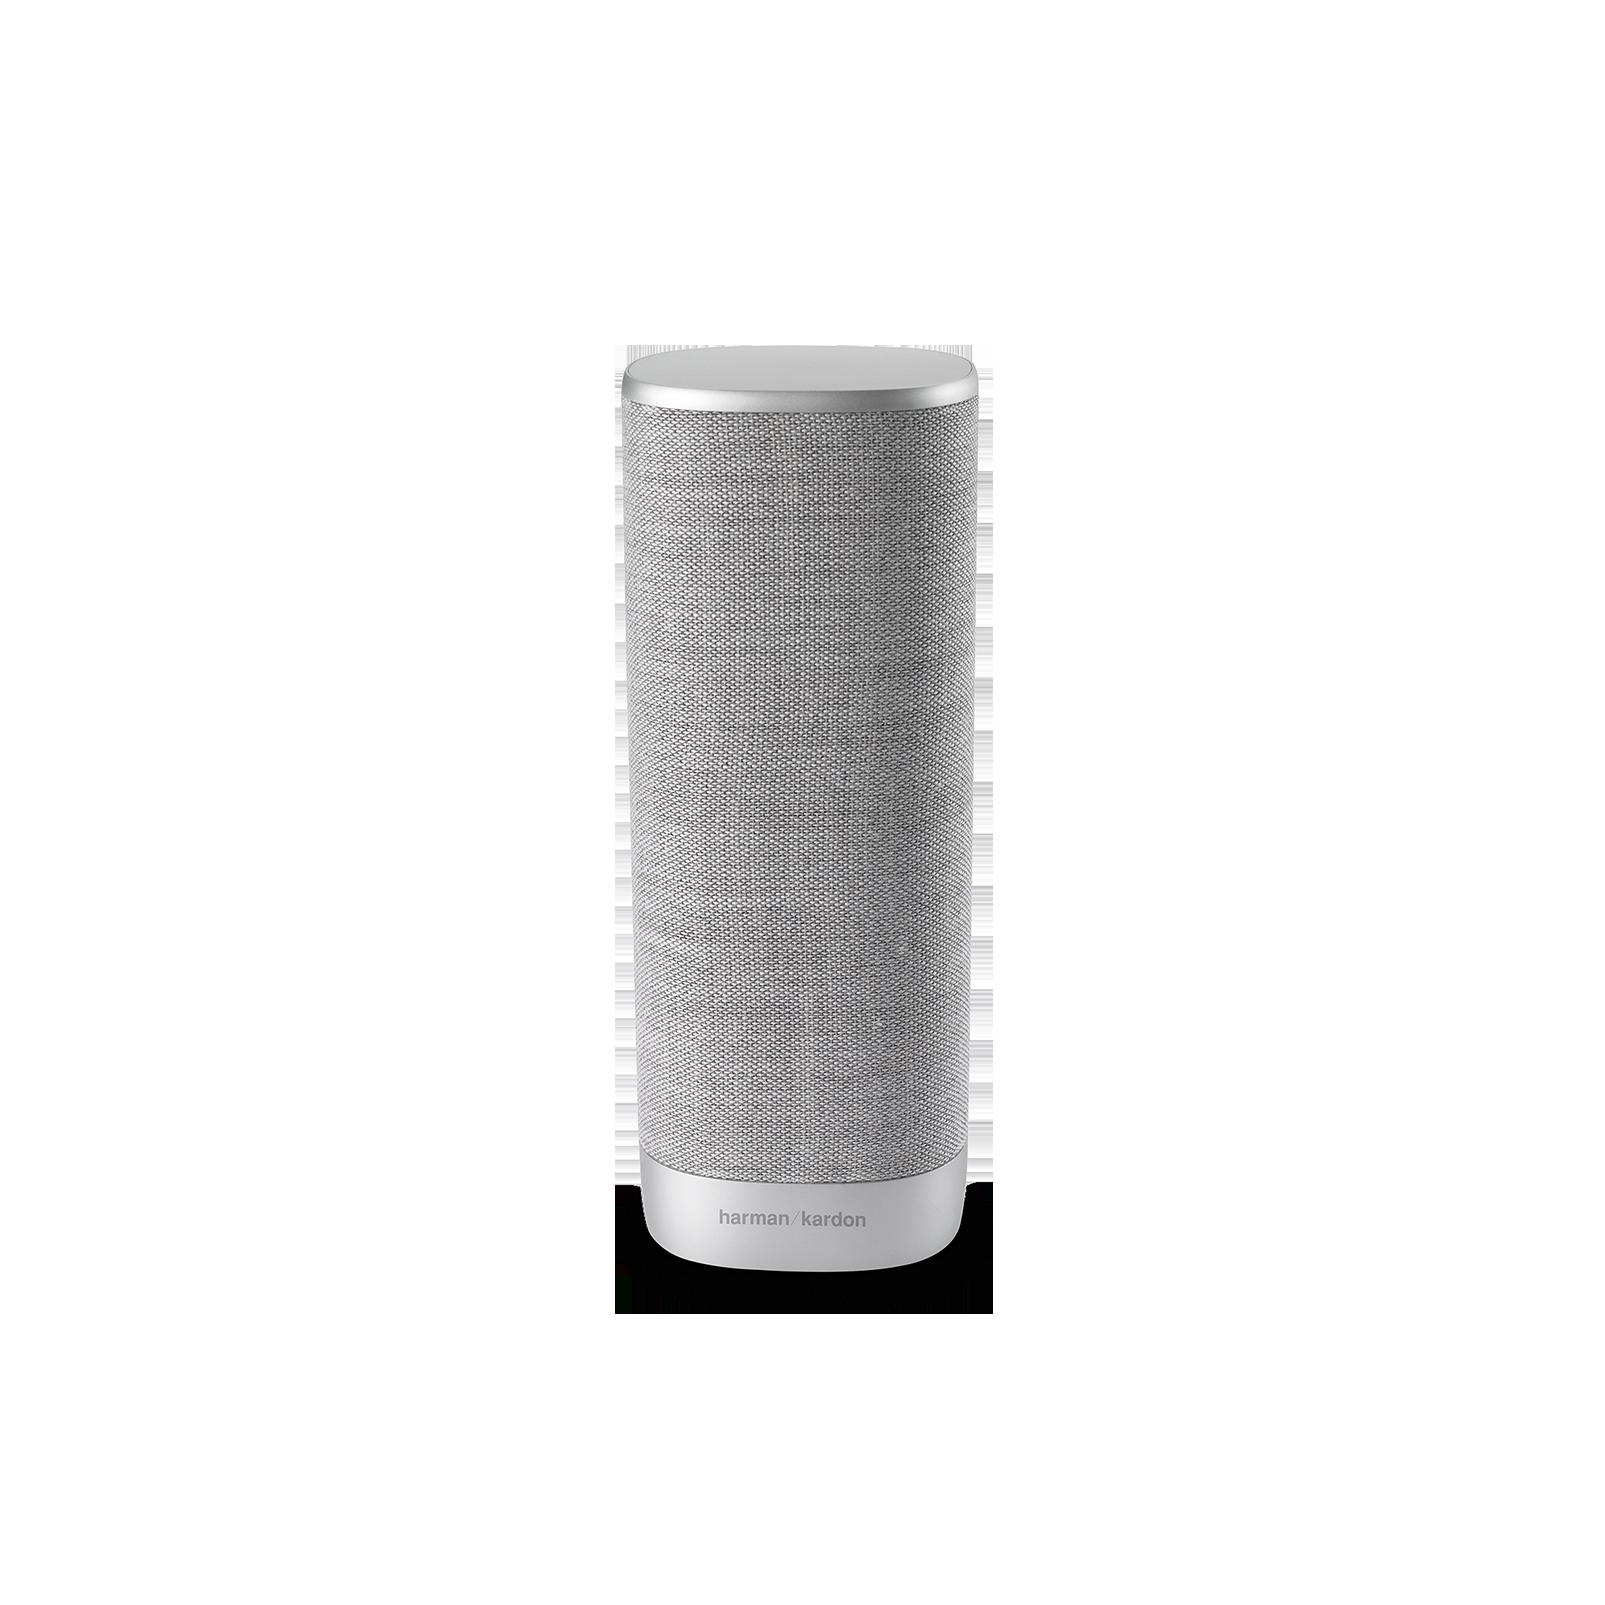 Harman Kardon Citation Surround - Grey - Surround sound for immersive movie experience - Front